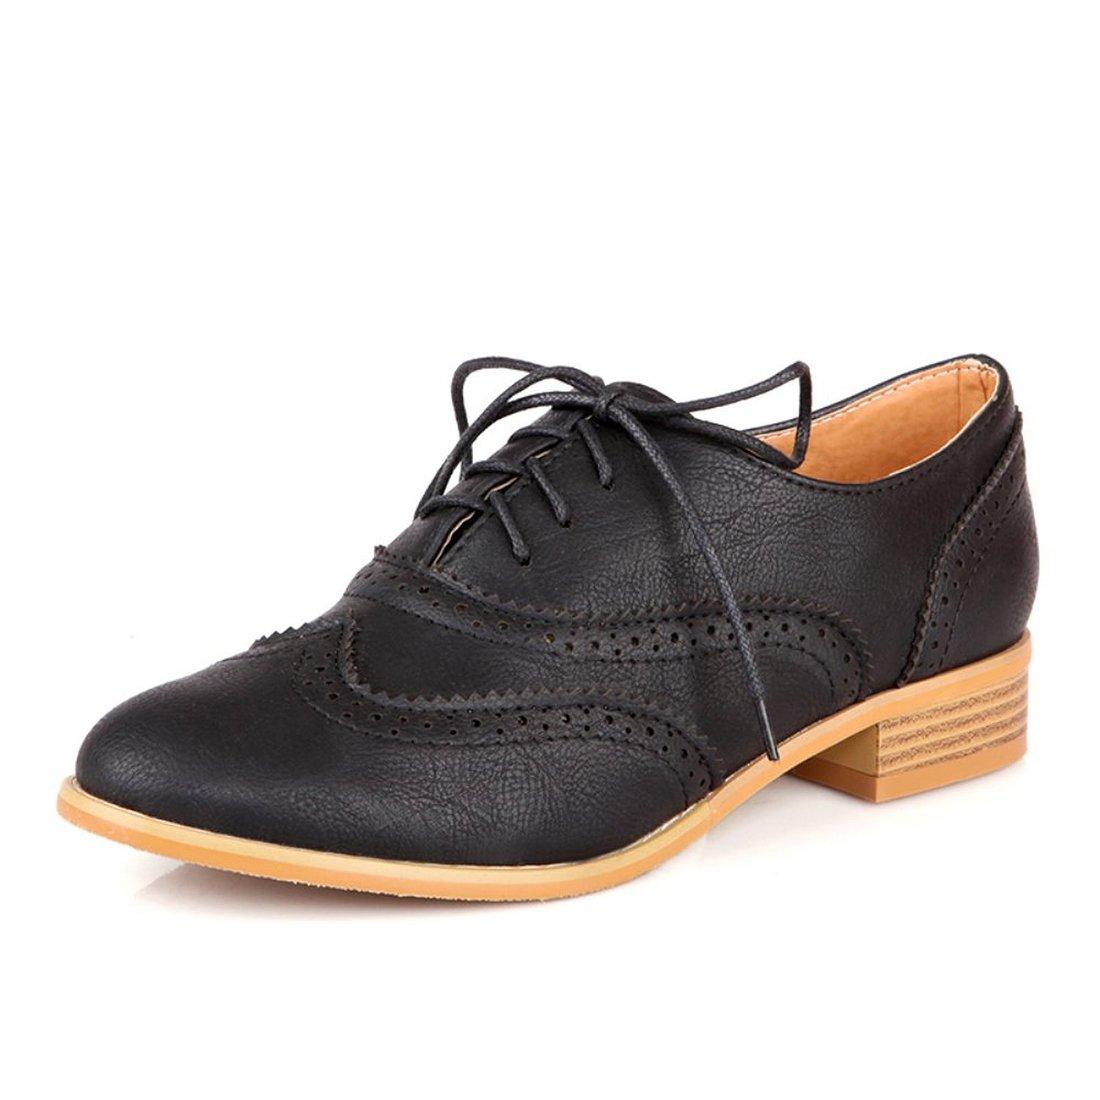 Susanny Women Classic Modern Sweet Low Heel Lace up Carving Wingtip PU Black Brogue Oxfords Dress Shoes 10 B (M) US(EU 43)